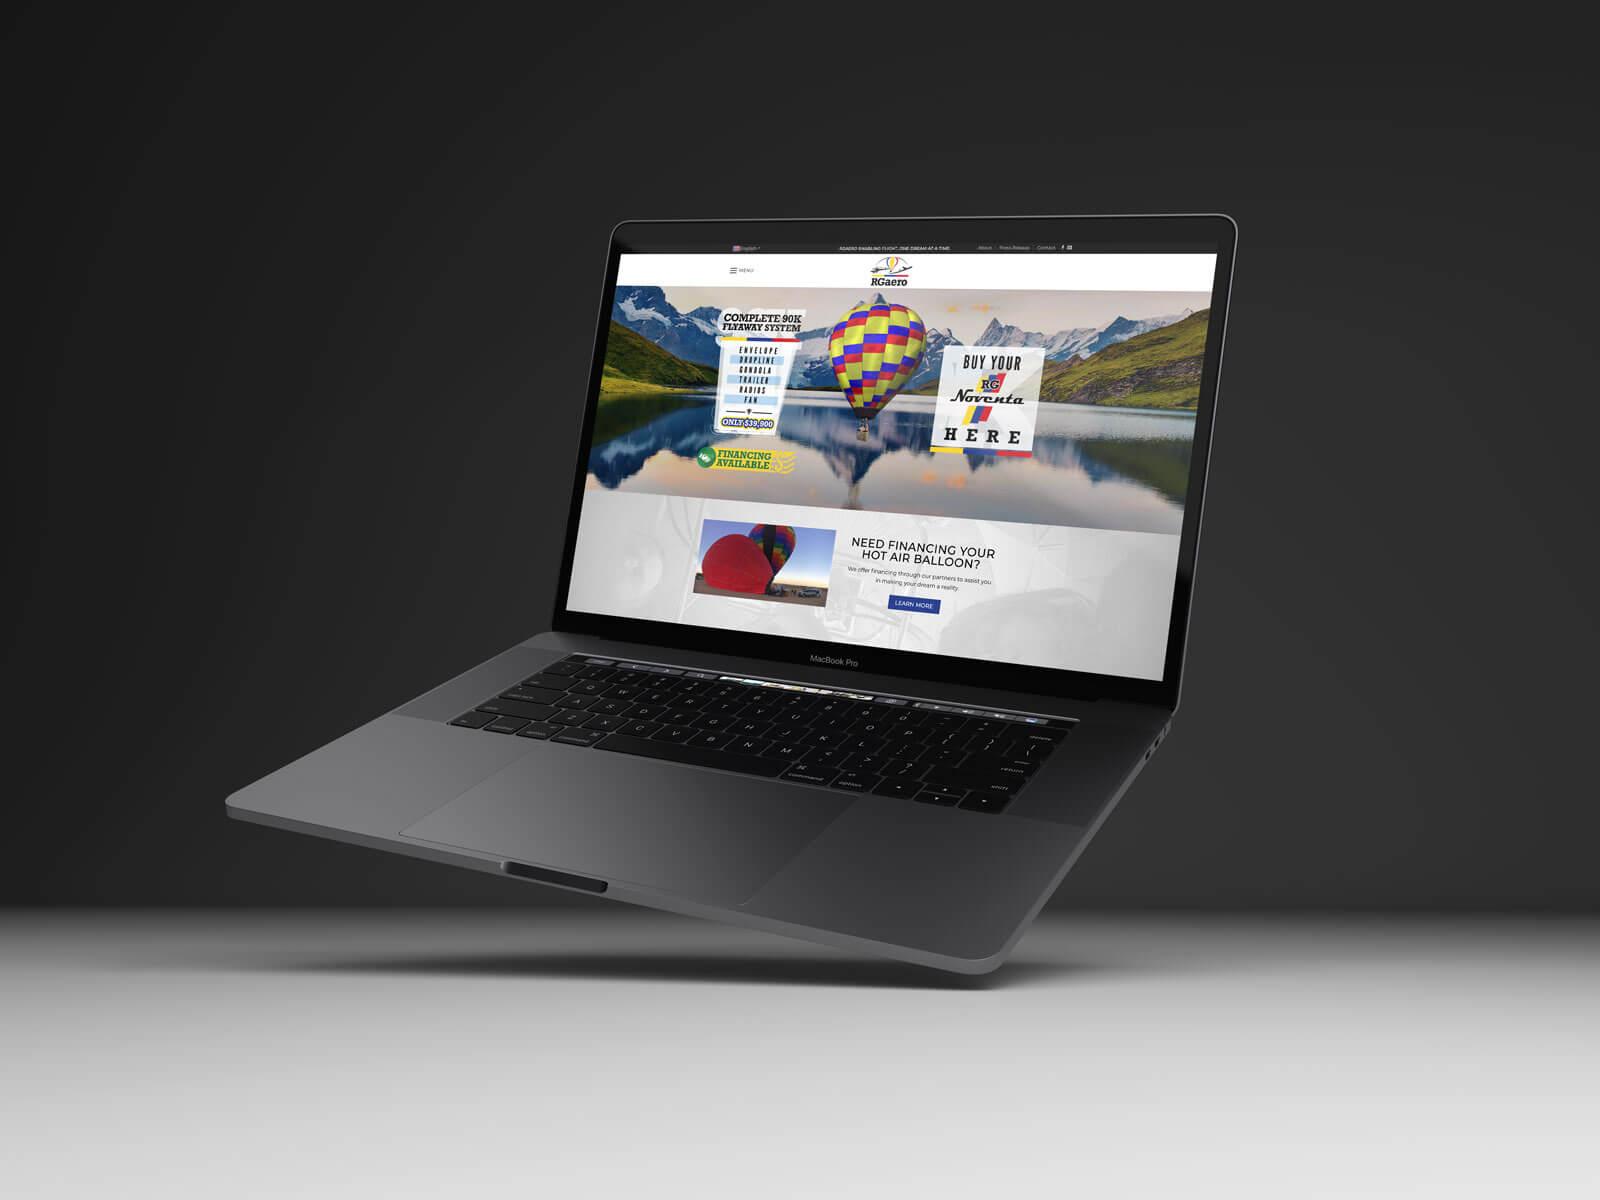 rgaero-macbook